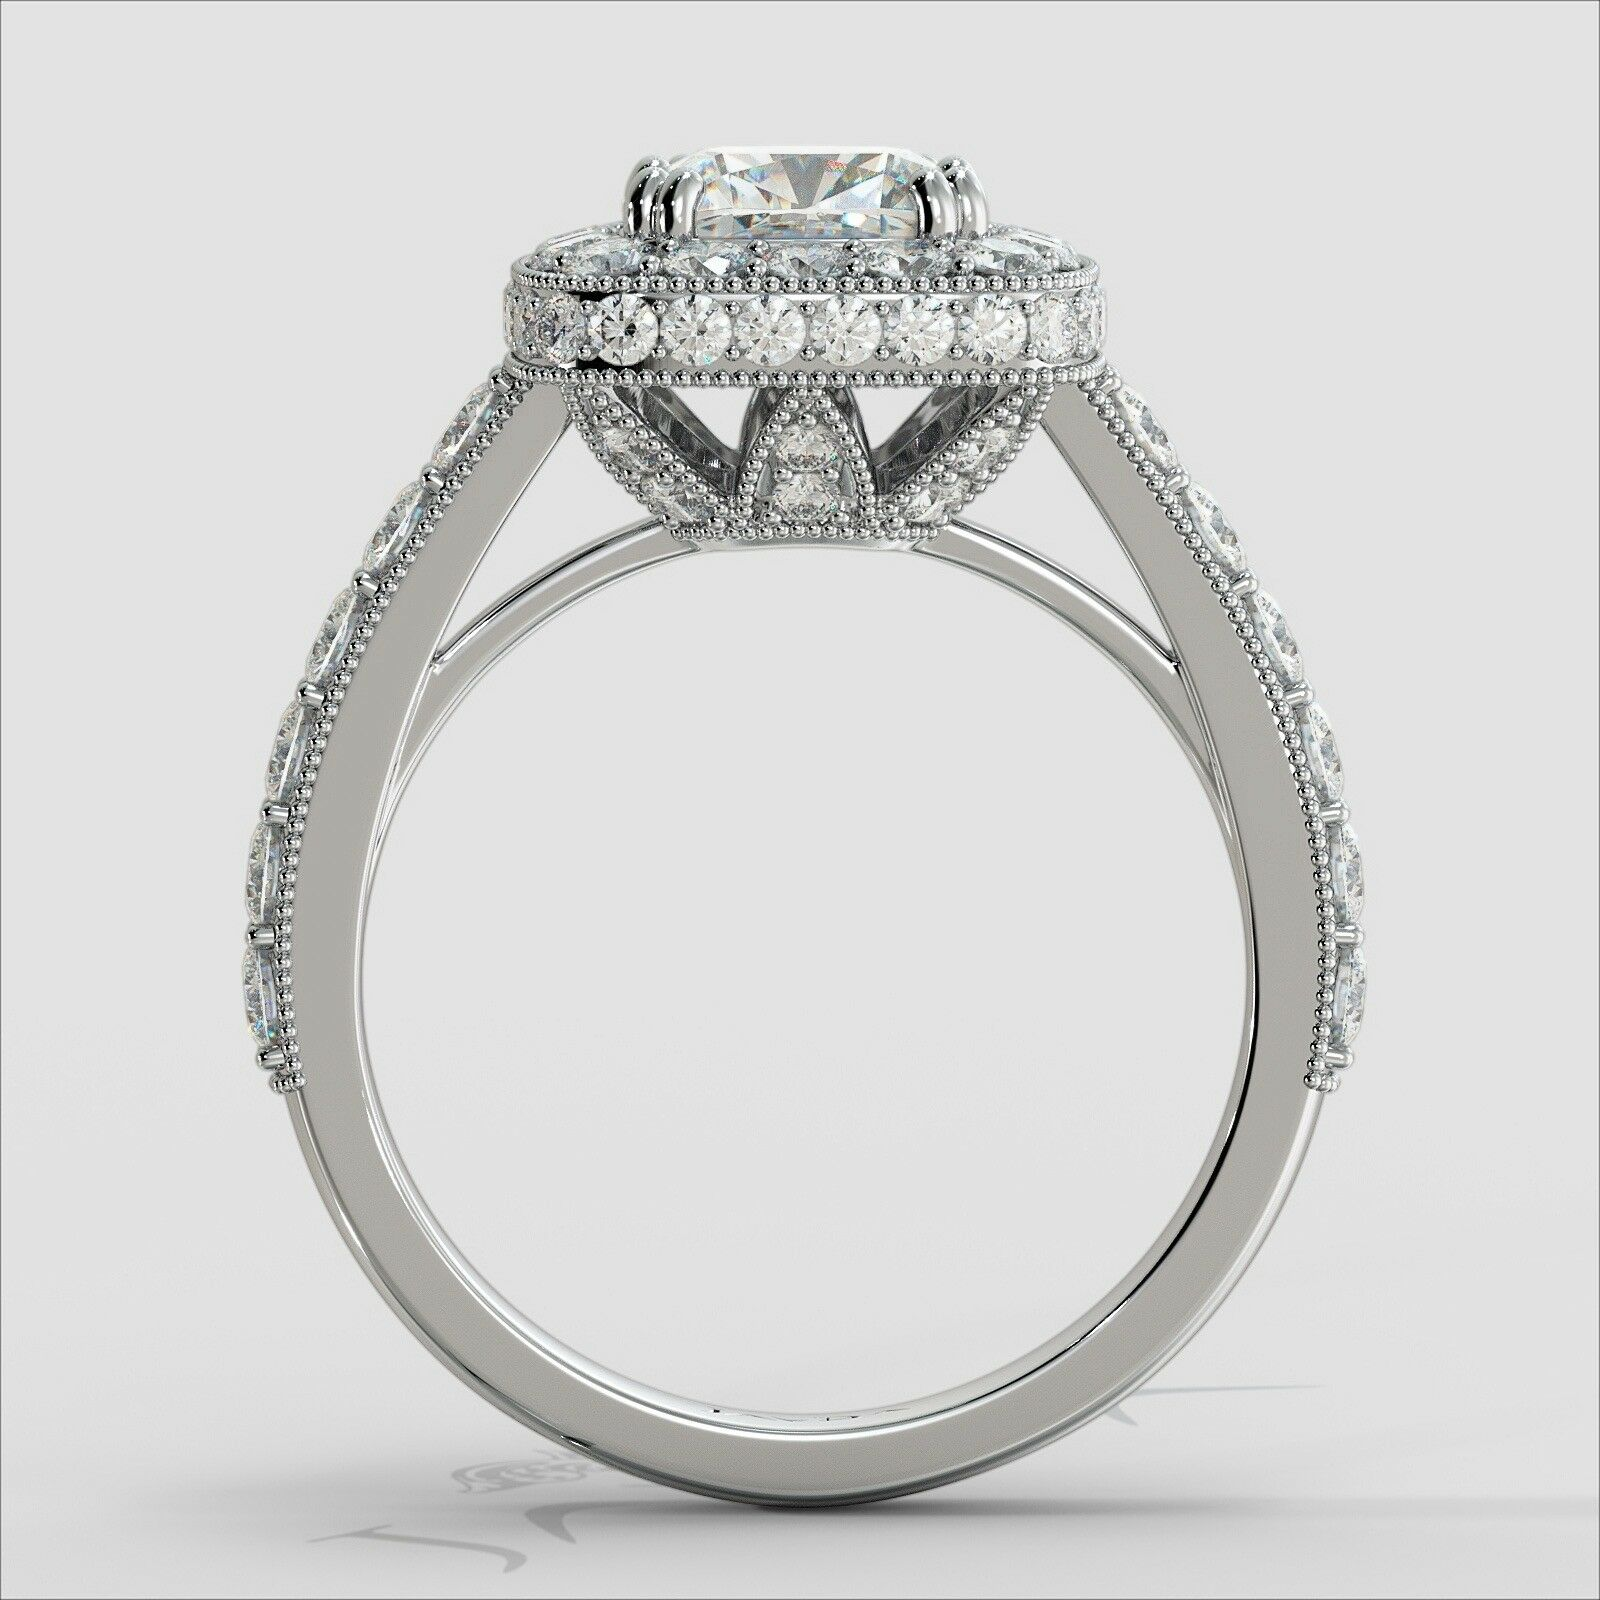 1.94ctw Milgrain Floral Basket Cushion Diamond Engagement Ring GIA E-VVS1 W Gold 3